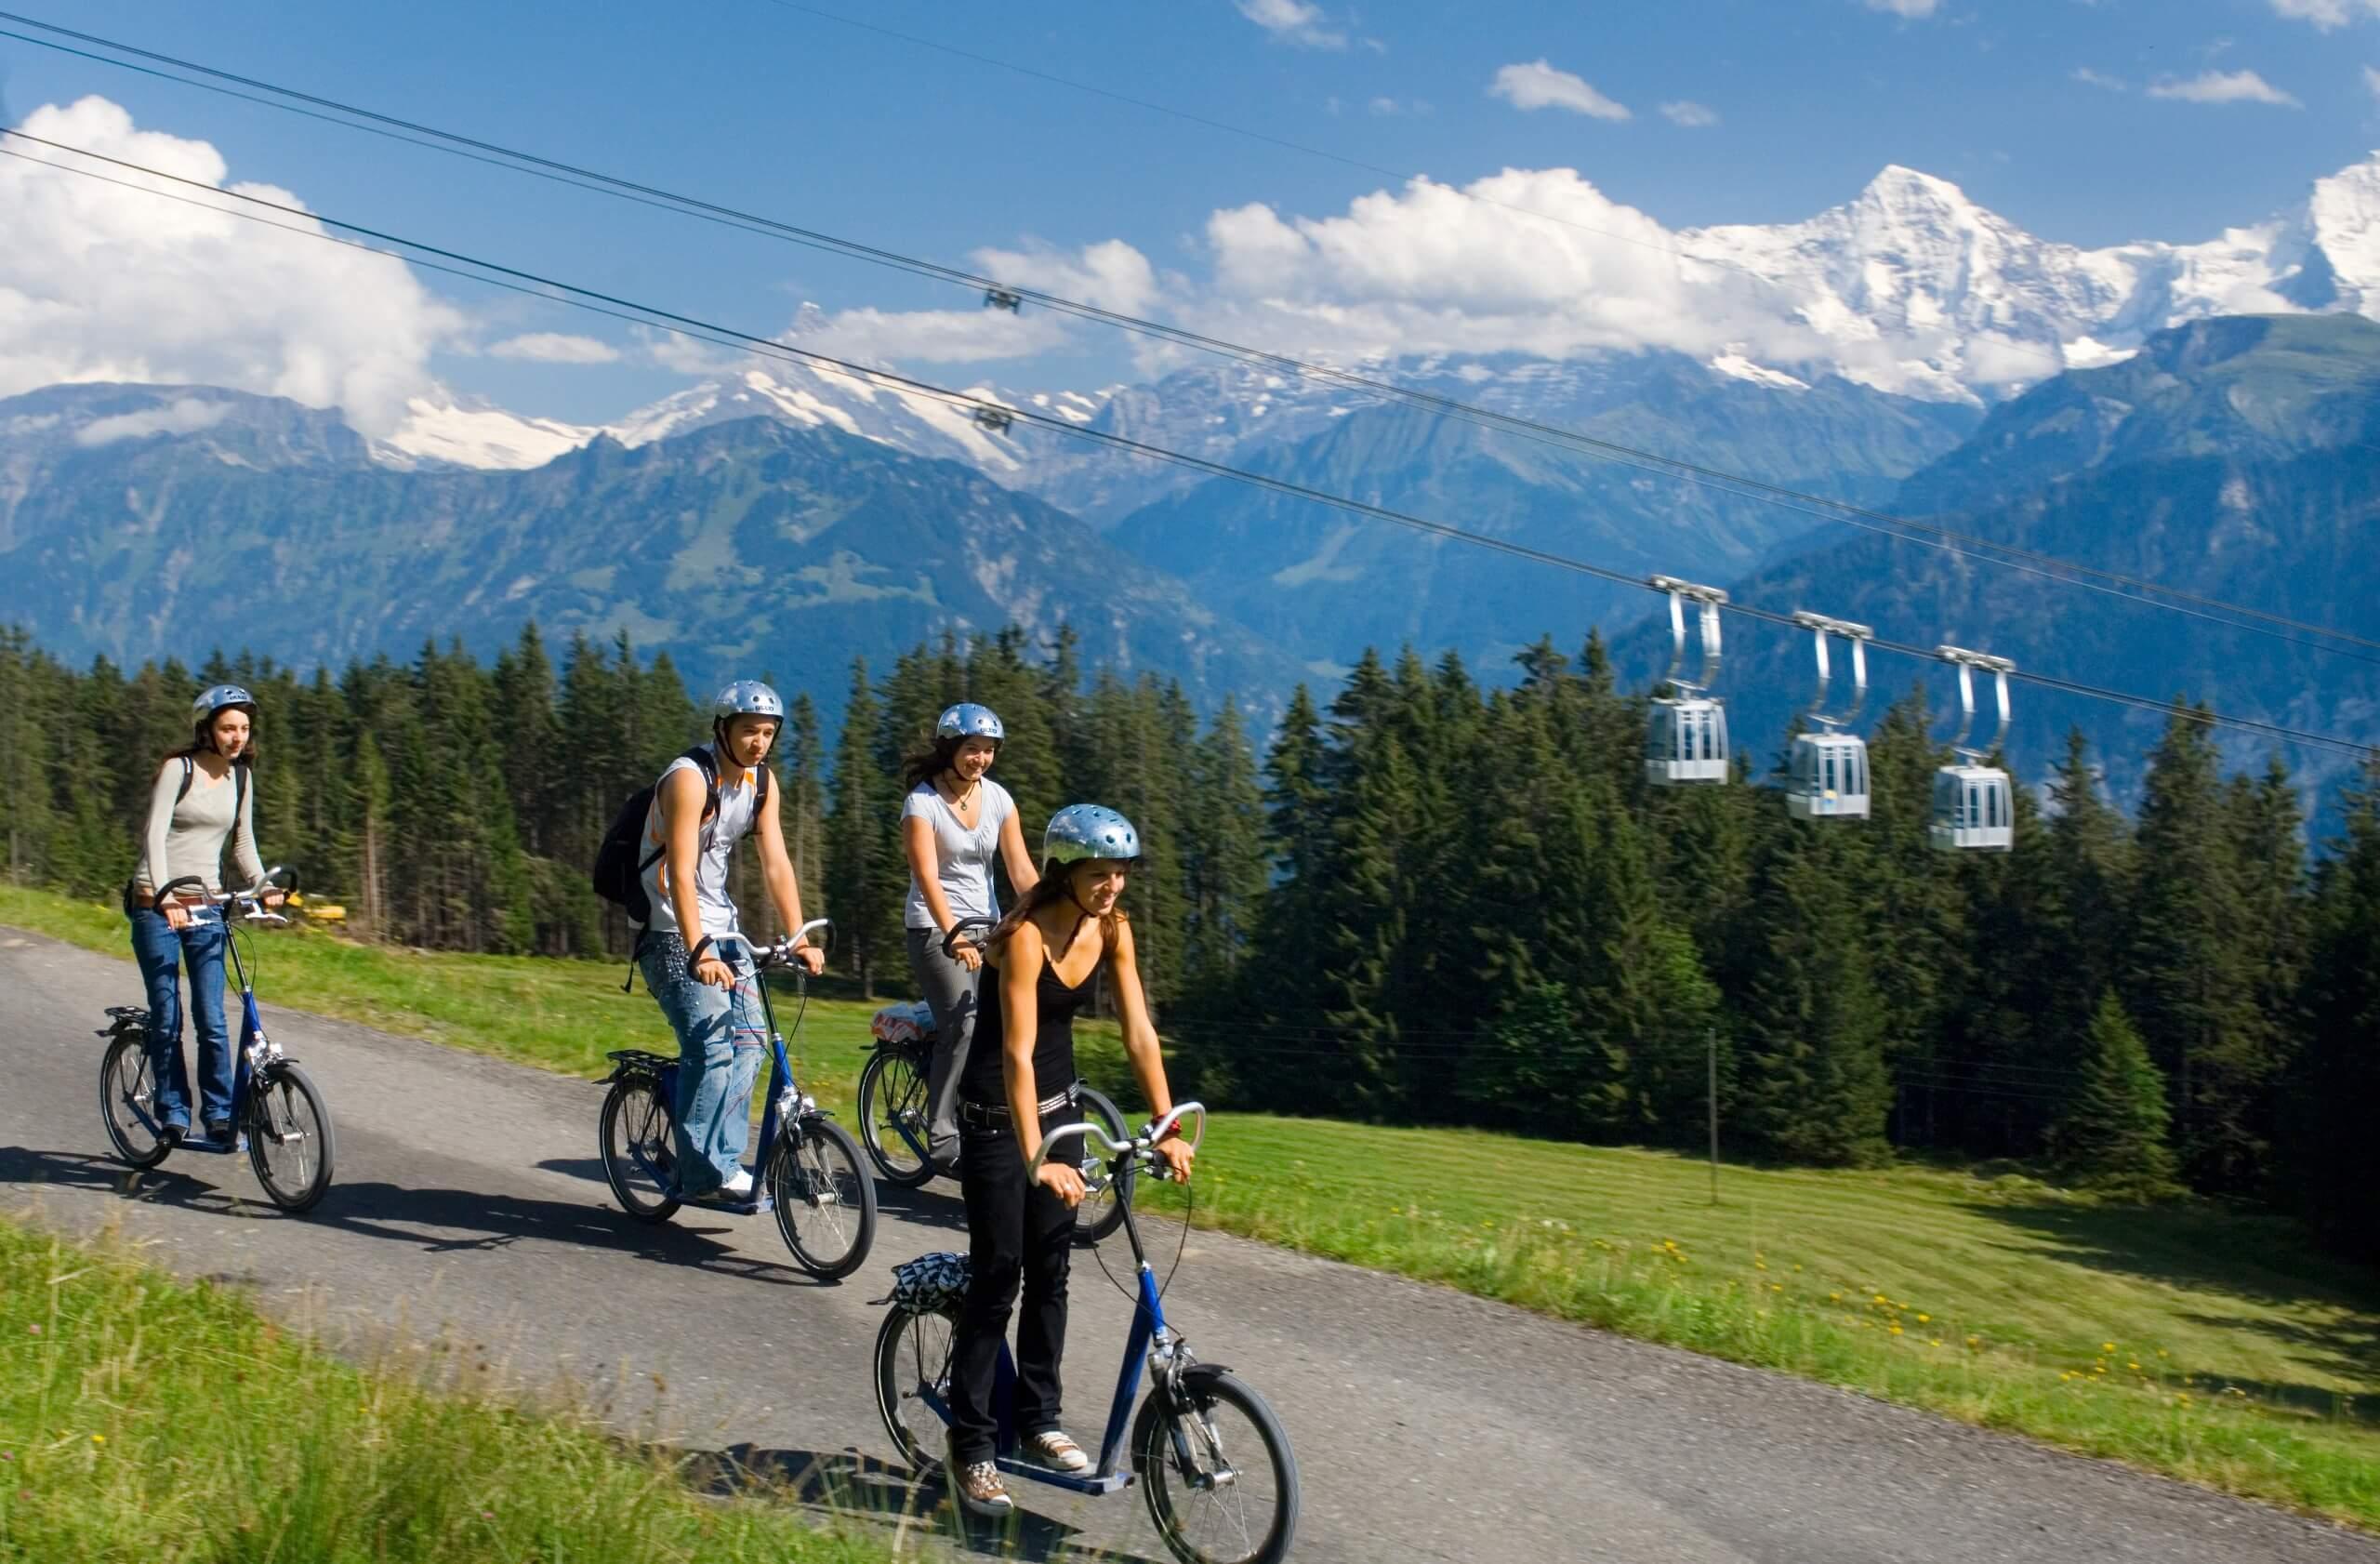 niederhorn-trotti-bike-familie-sommer-gondeln-panorama-velo-mountainbike